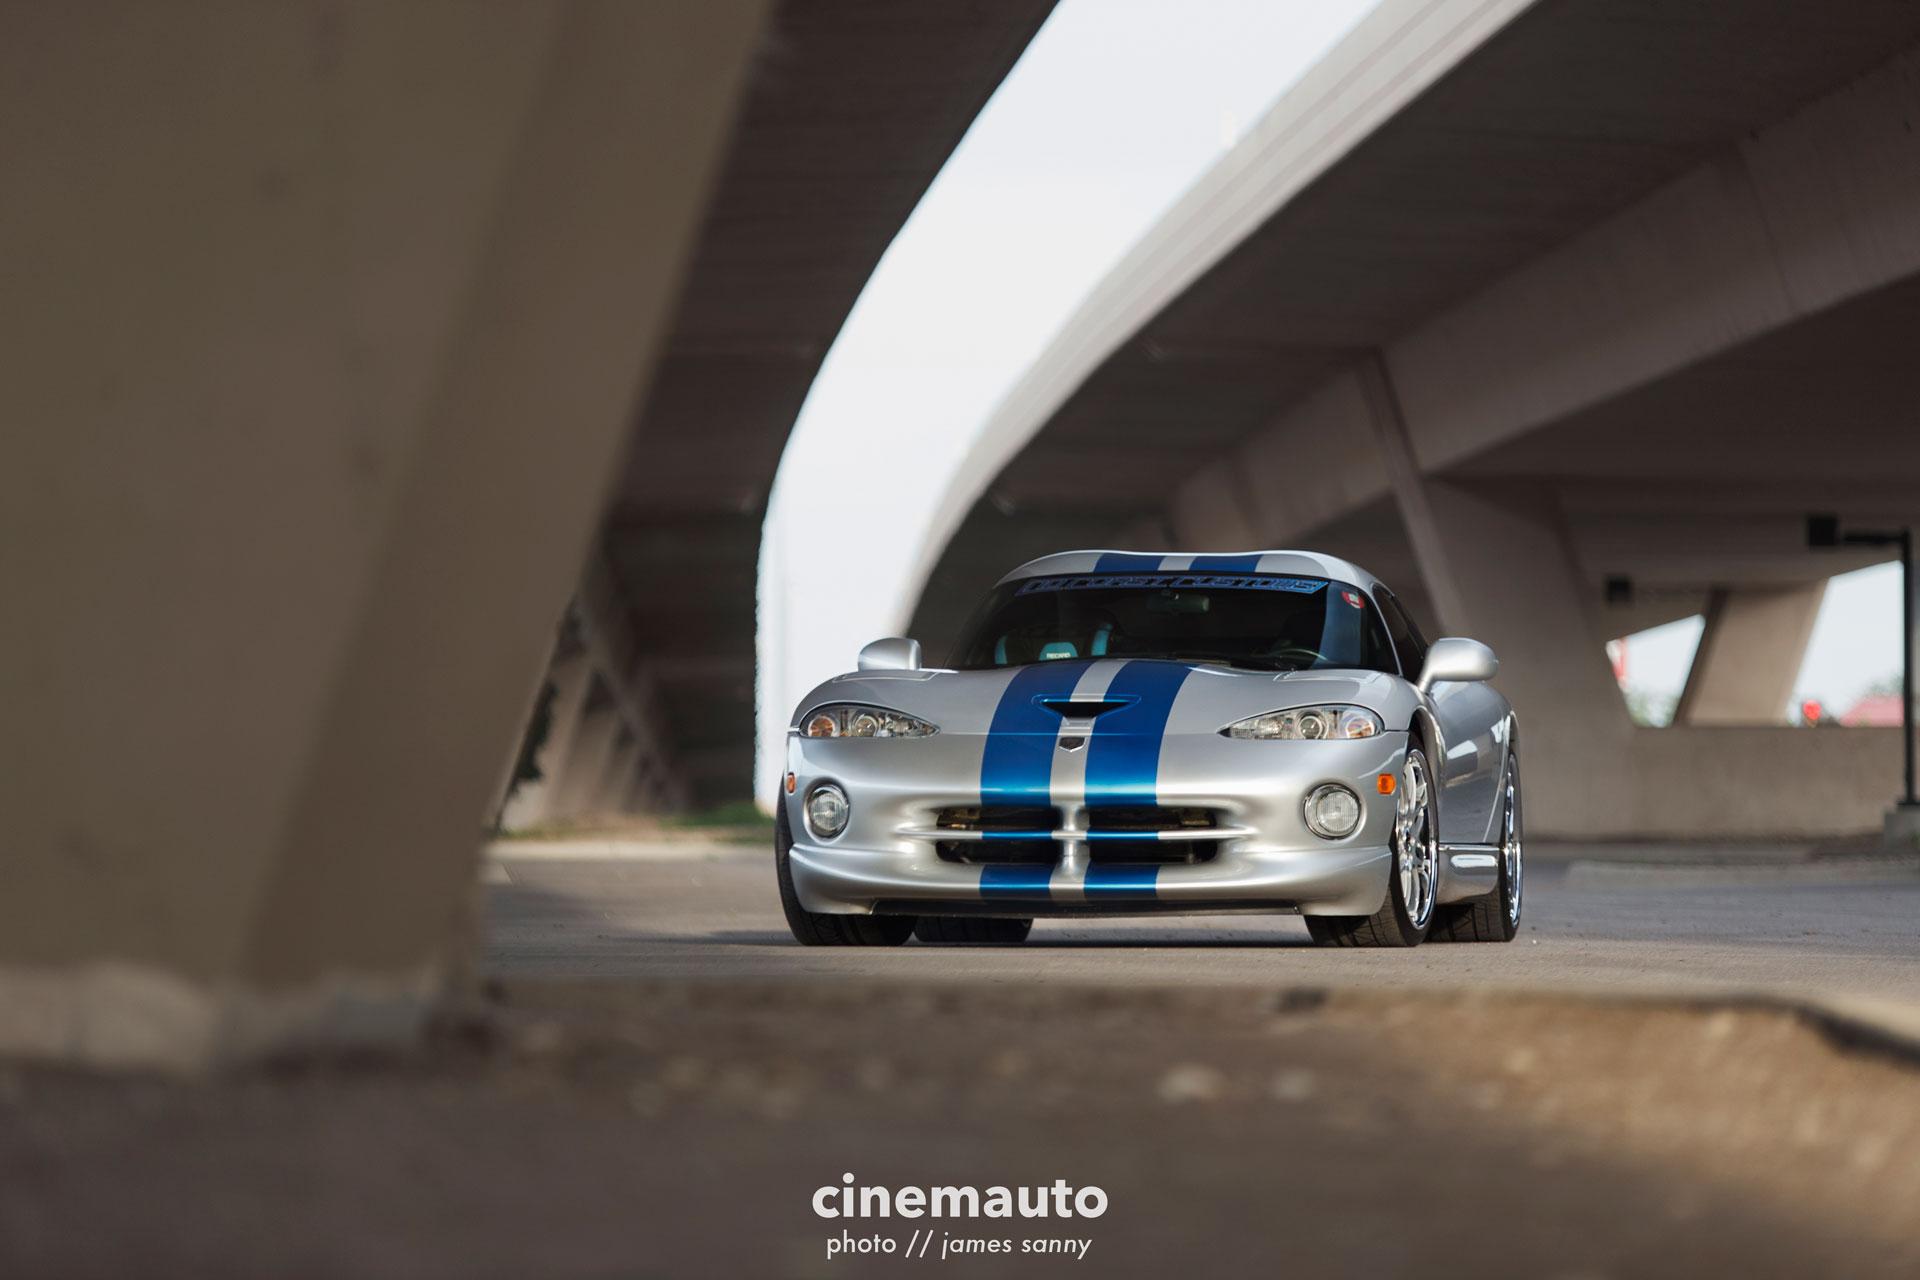 cinemauto-wichita-automotive-photography-ah4-sm.jpg